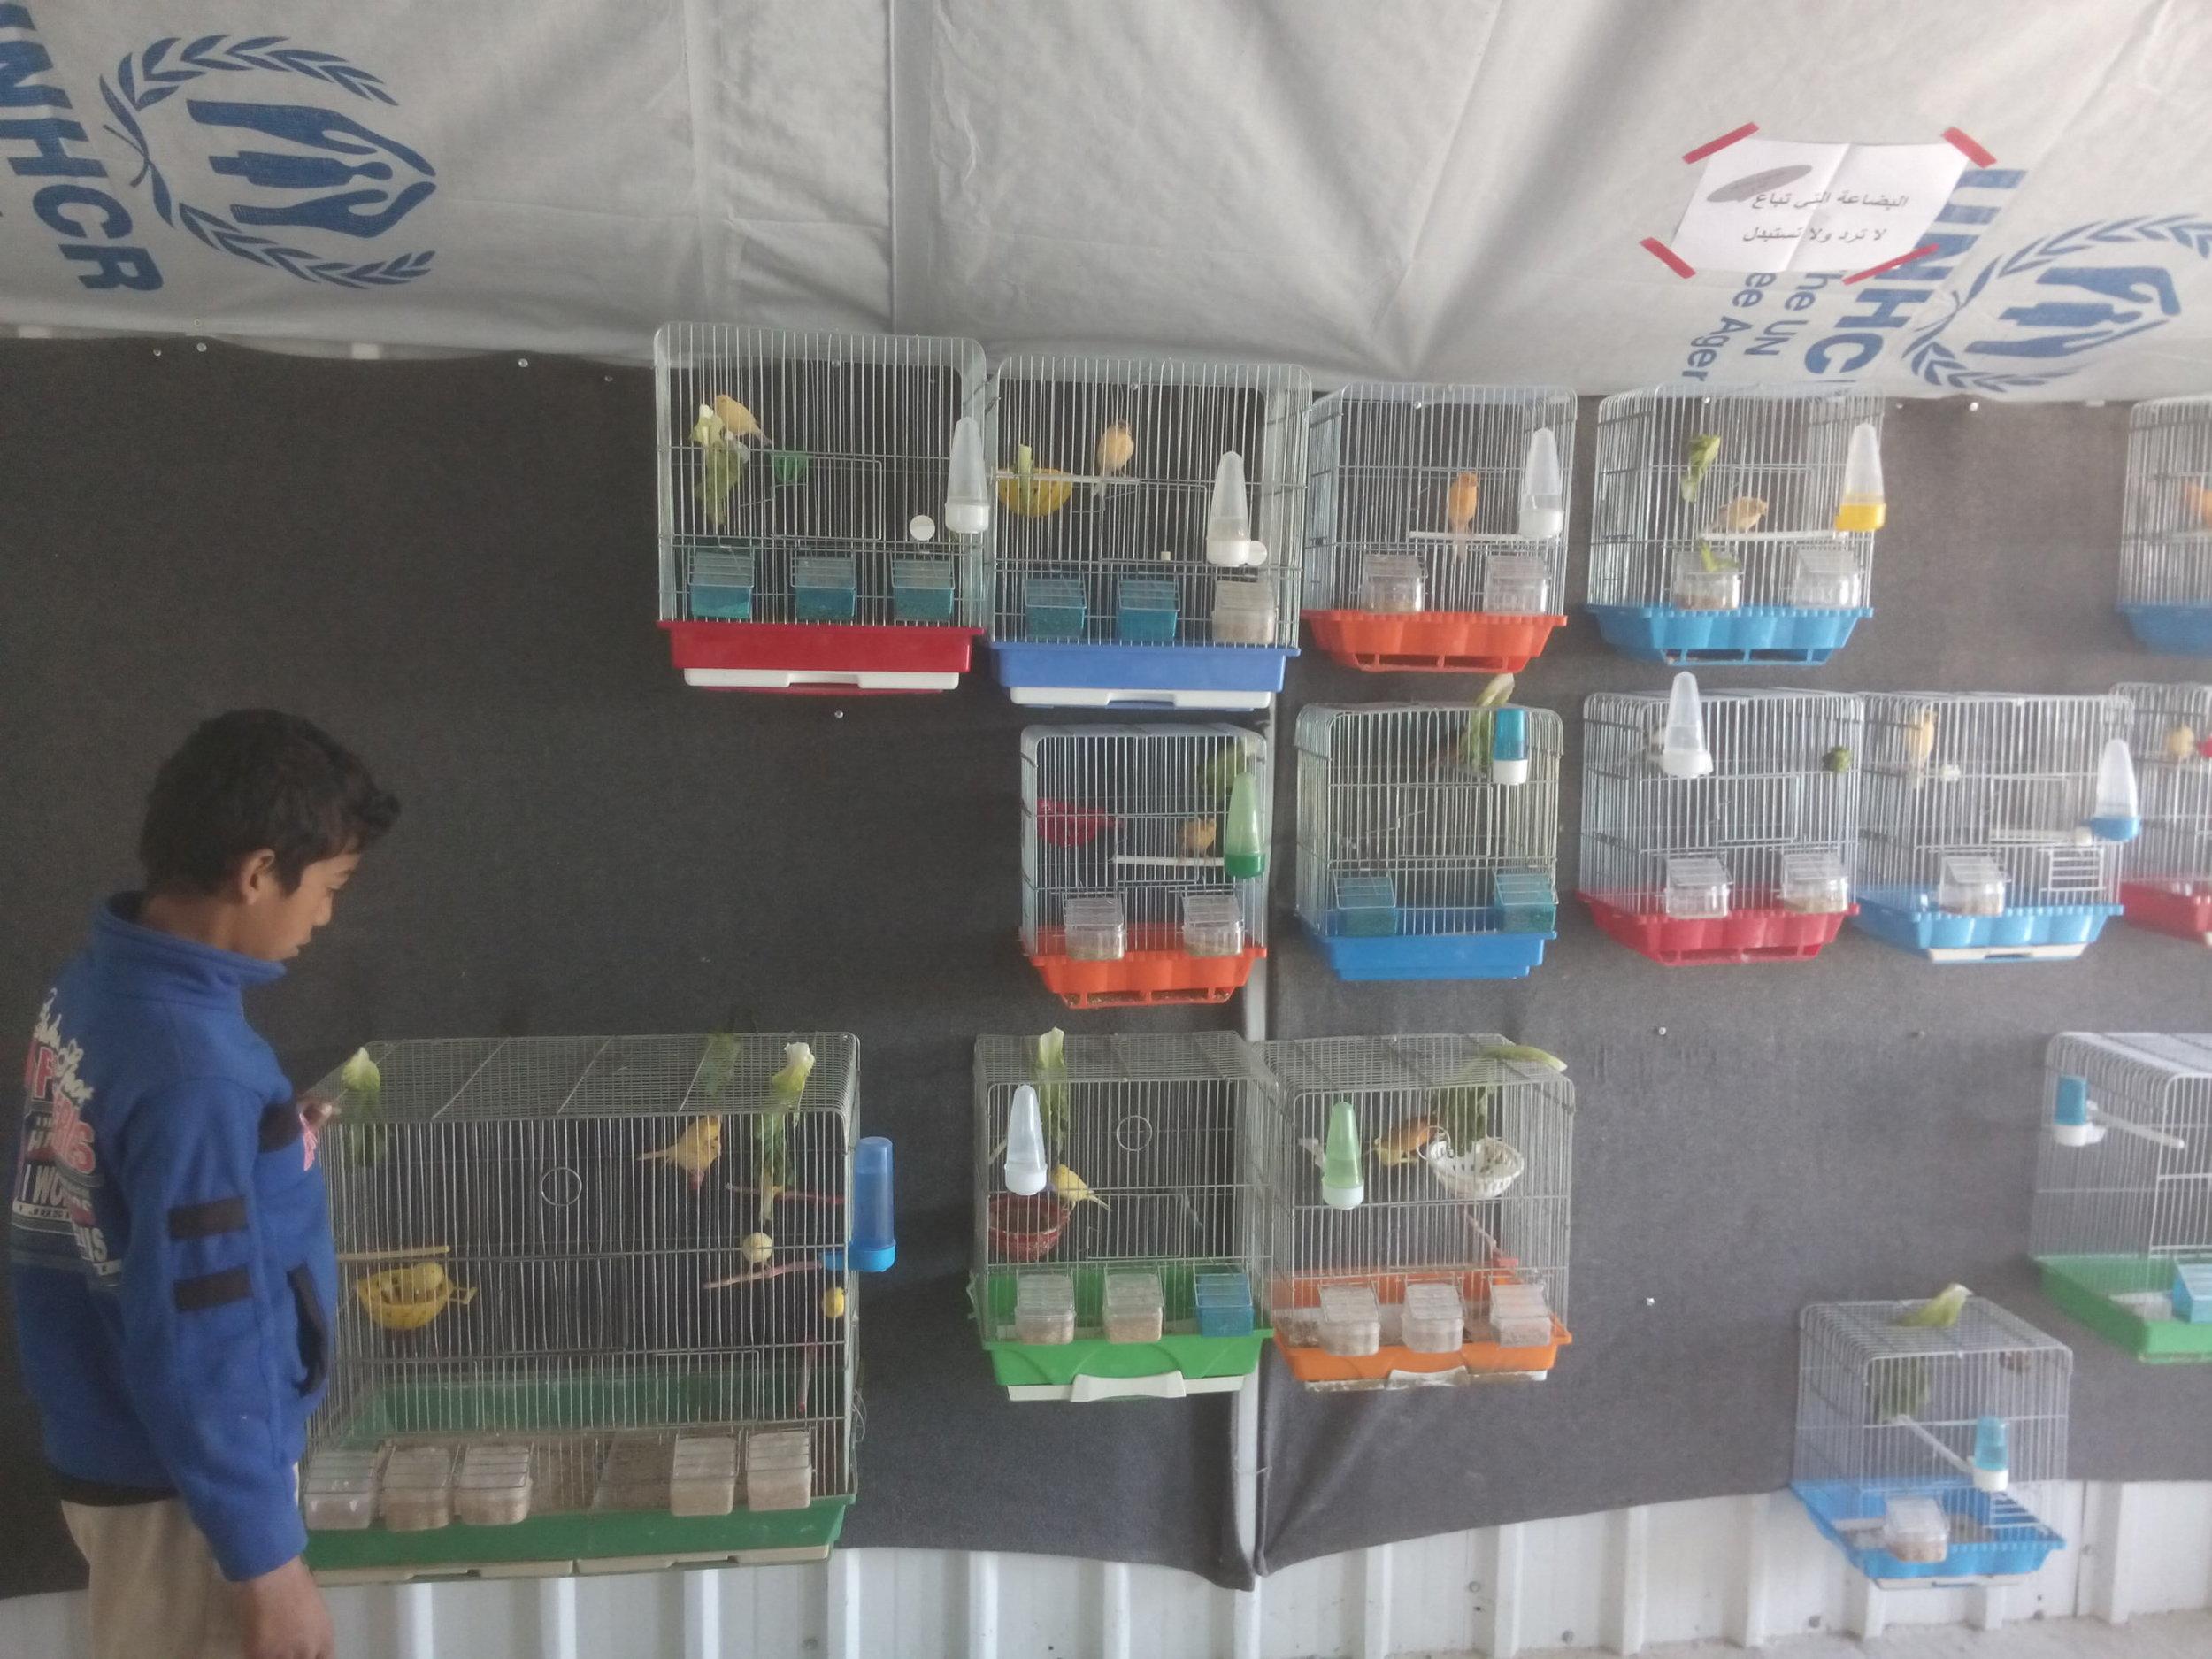 Caged birds for sale in Azraq camp, Jordan, November 2016 Photo: Ann-Christin Wagner (University of Edinburgh)